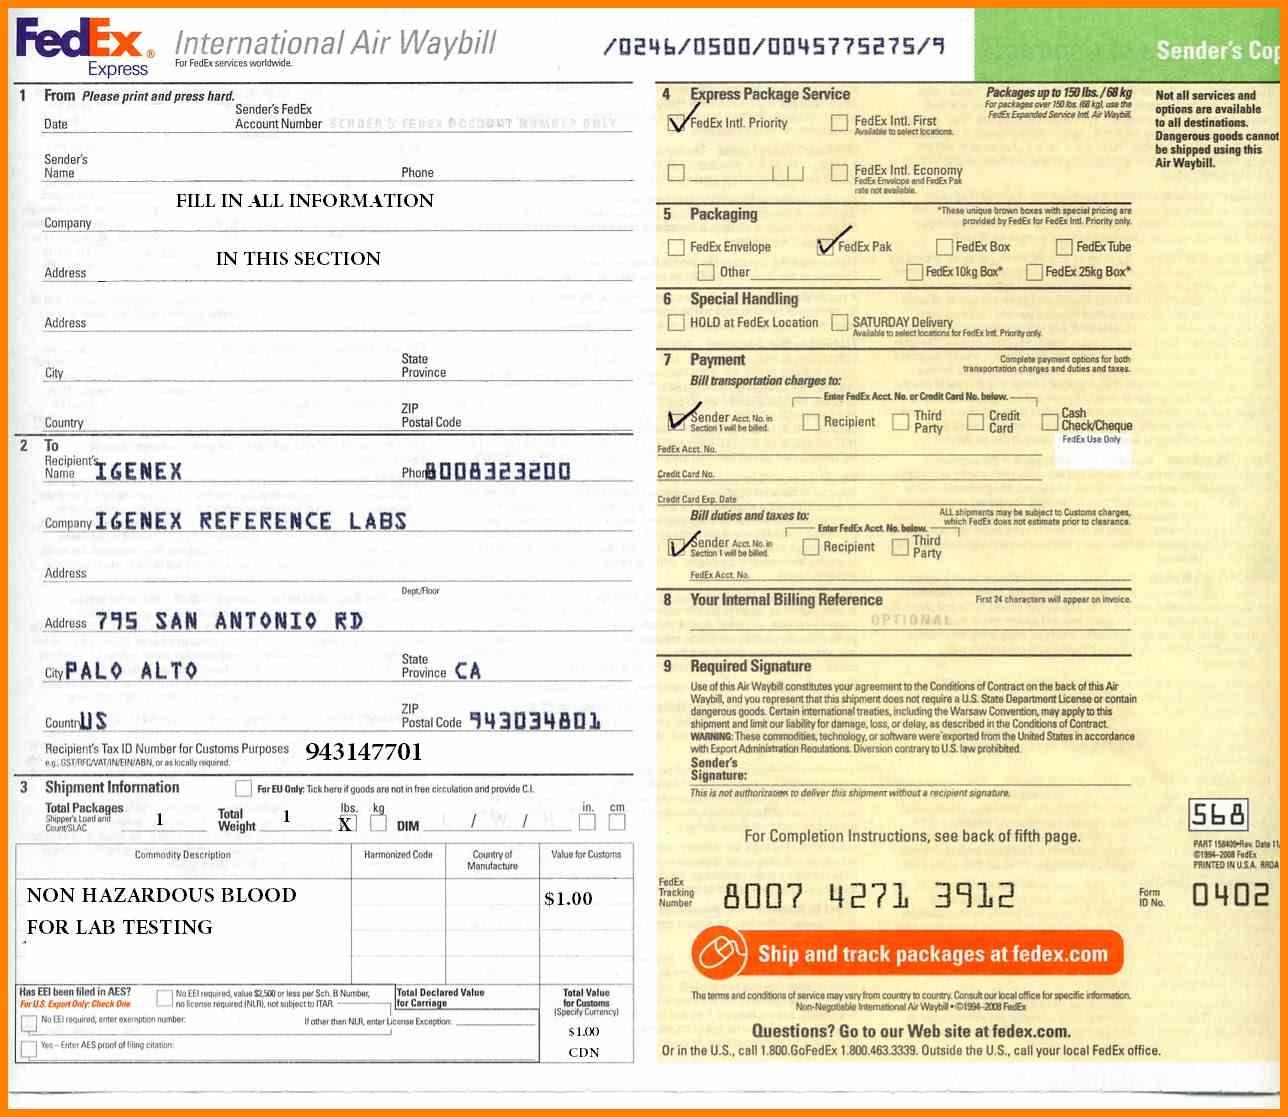 International Air Waybill Form Pdf